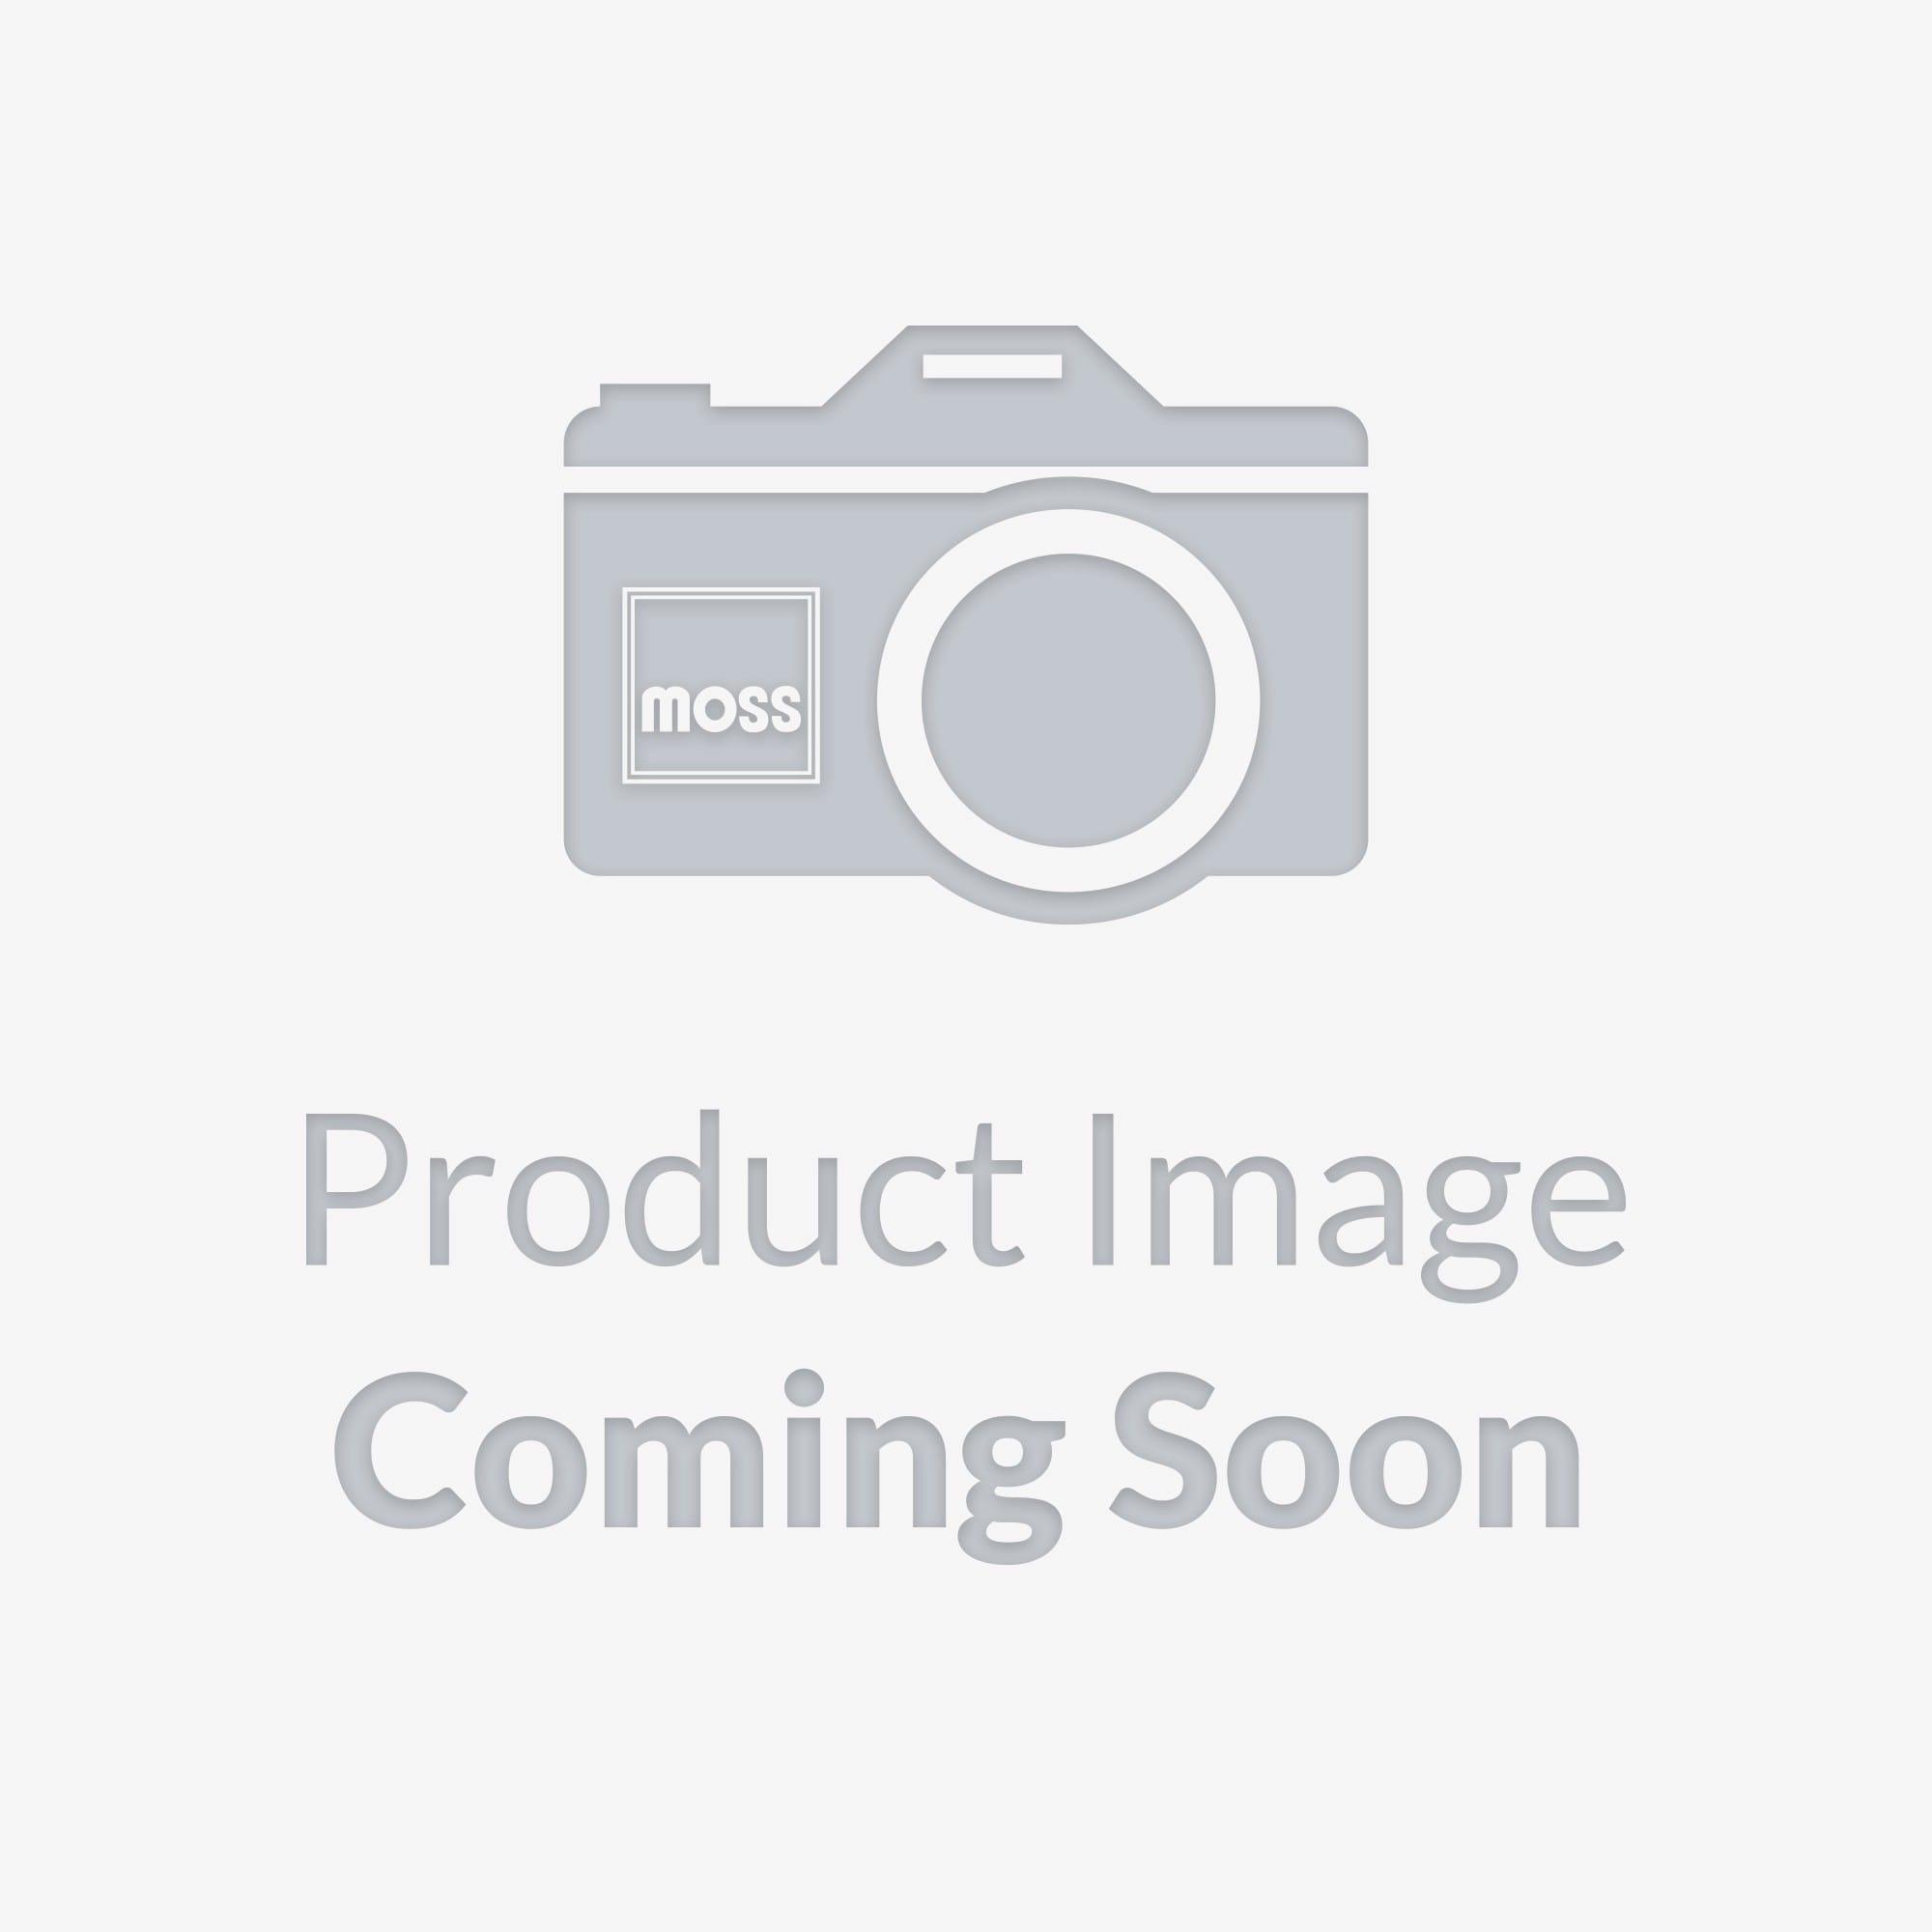 License Plate Frames - Zoom-Zoom | MossMiata